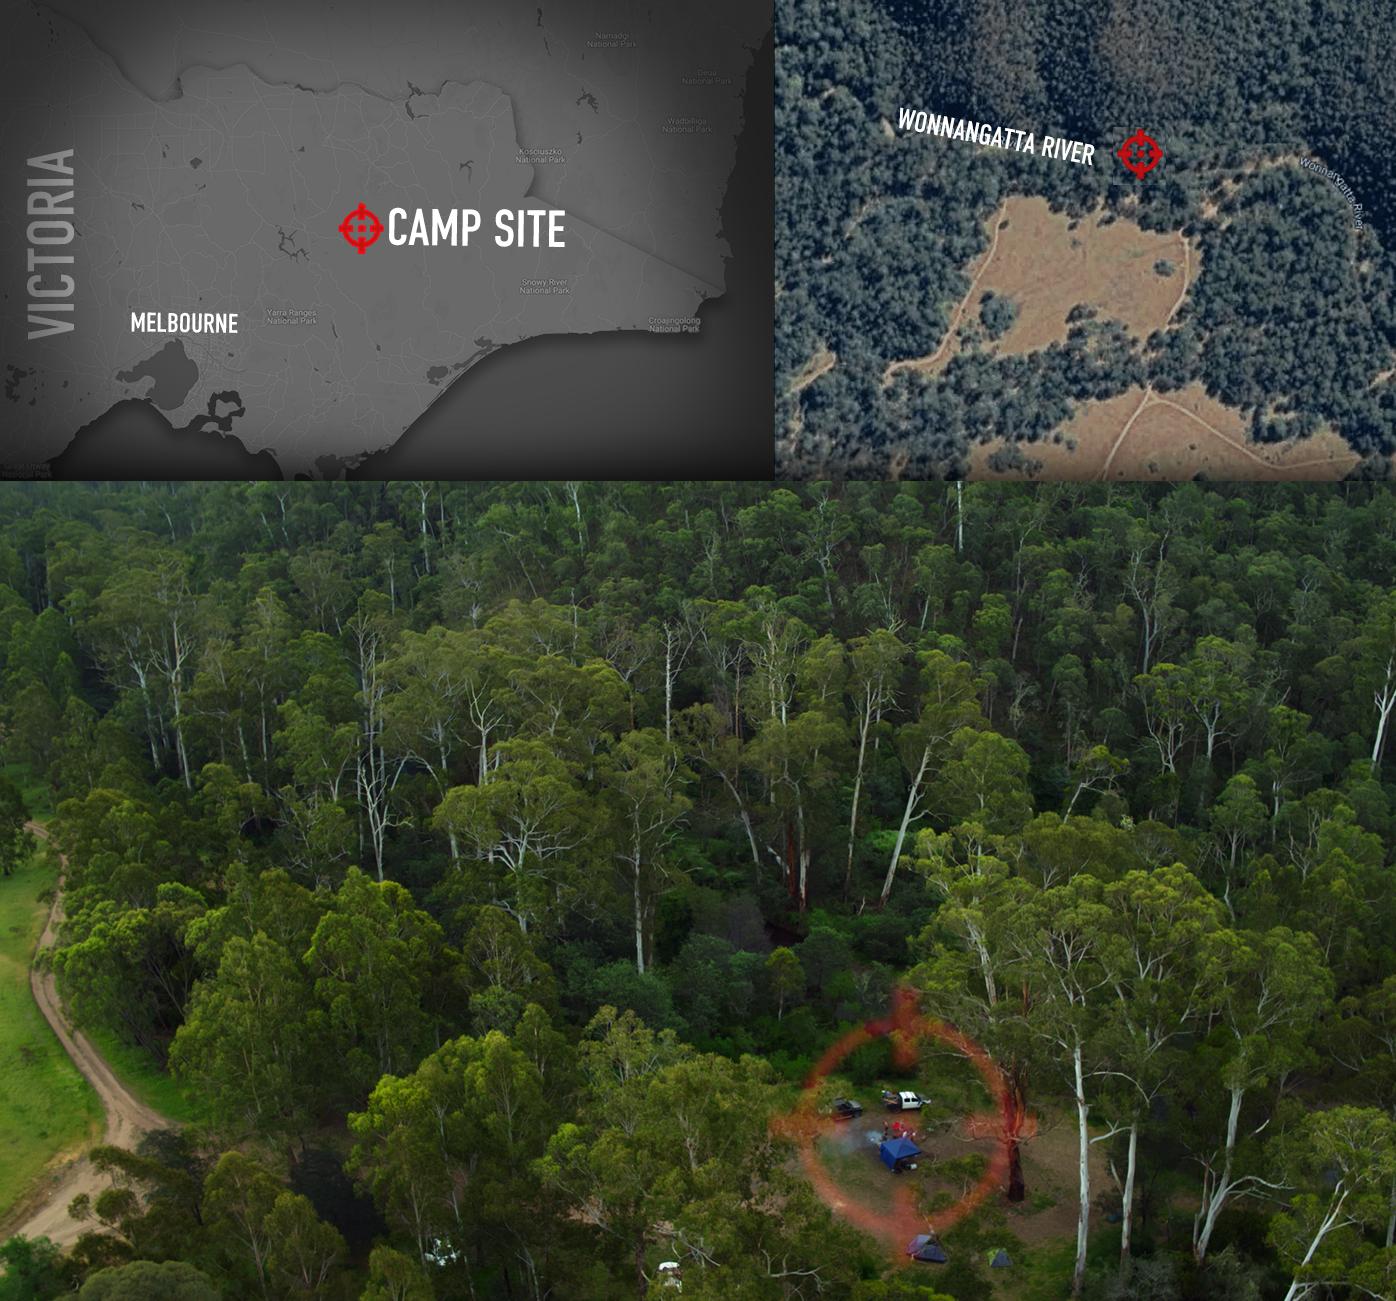 Under Investigation: Location of the campsite